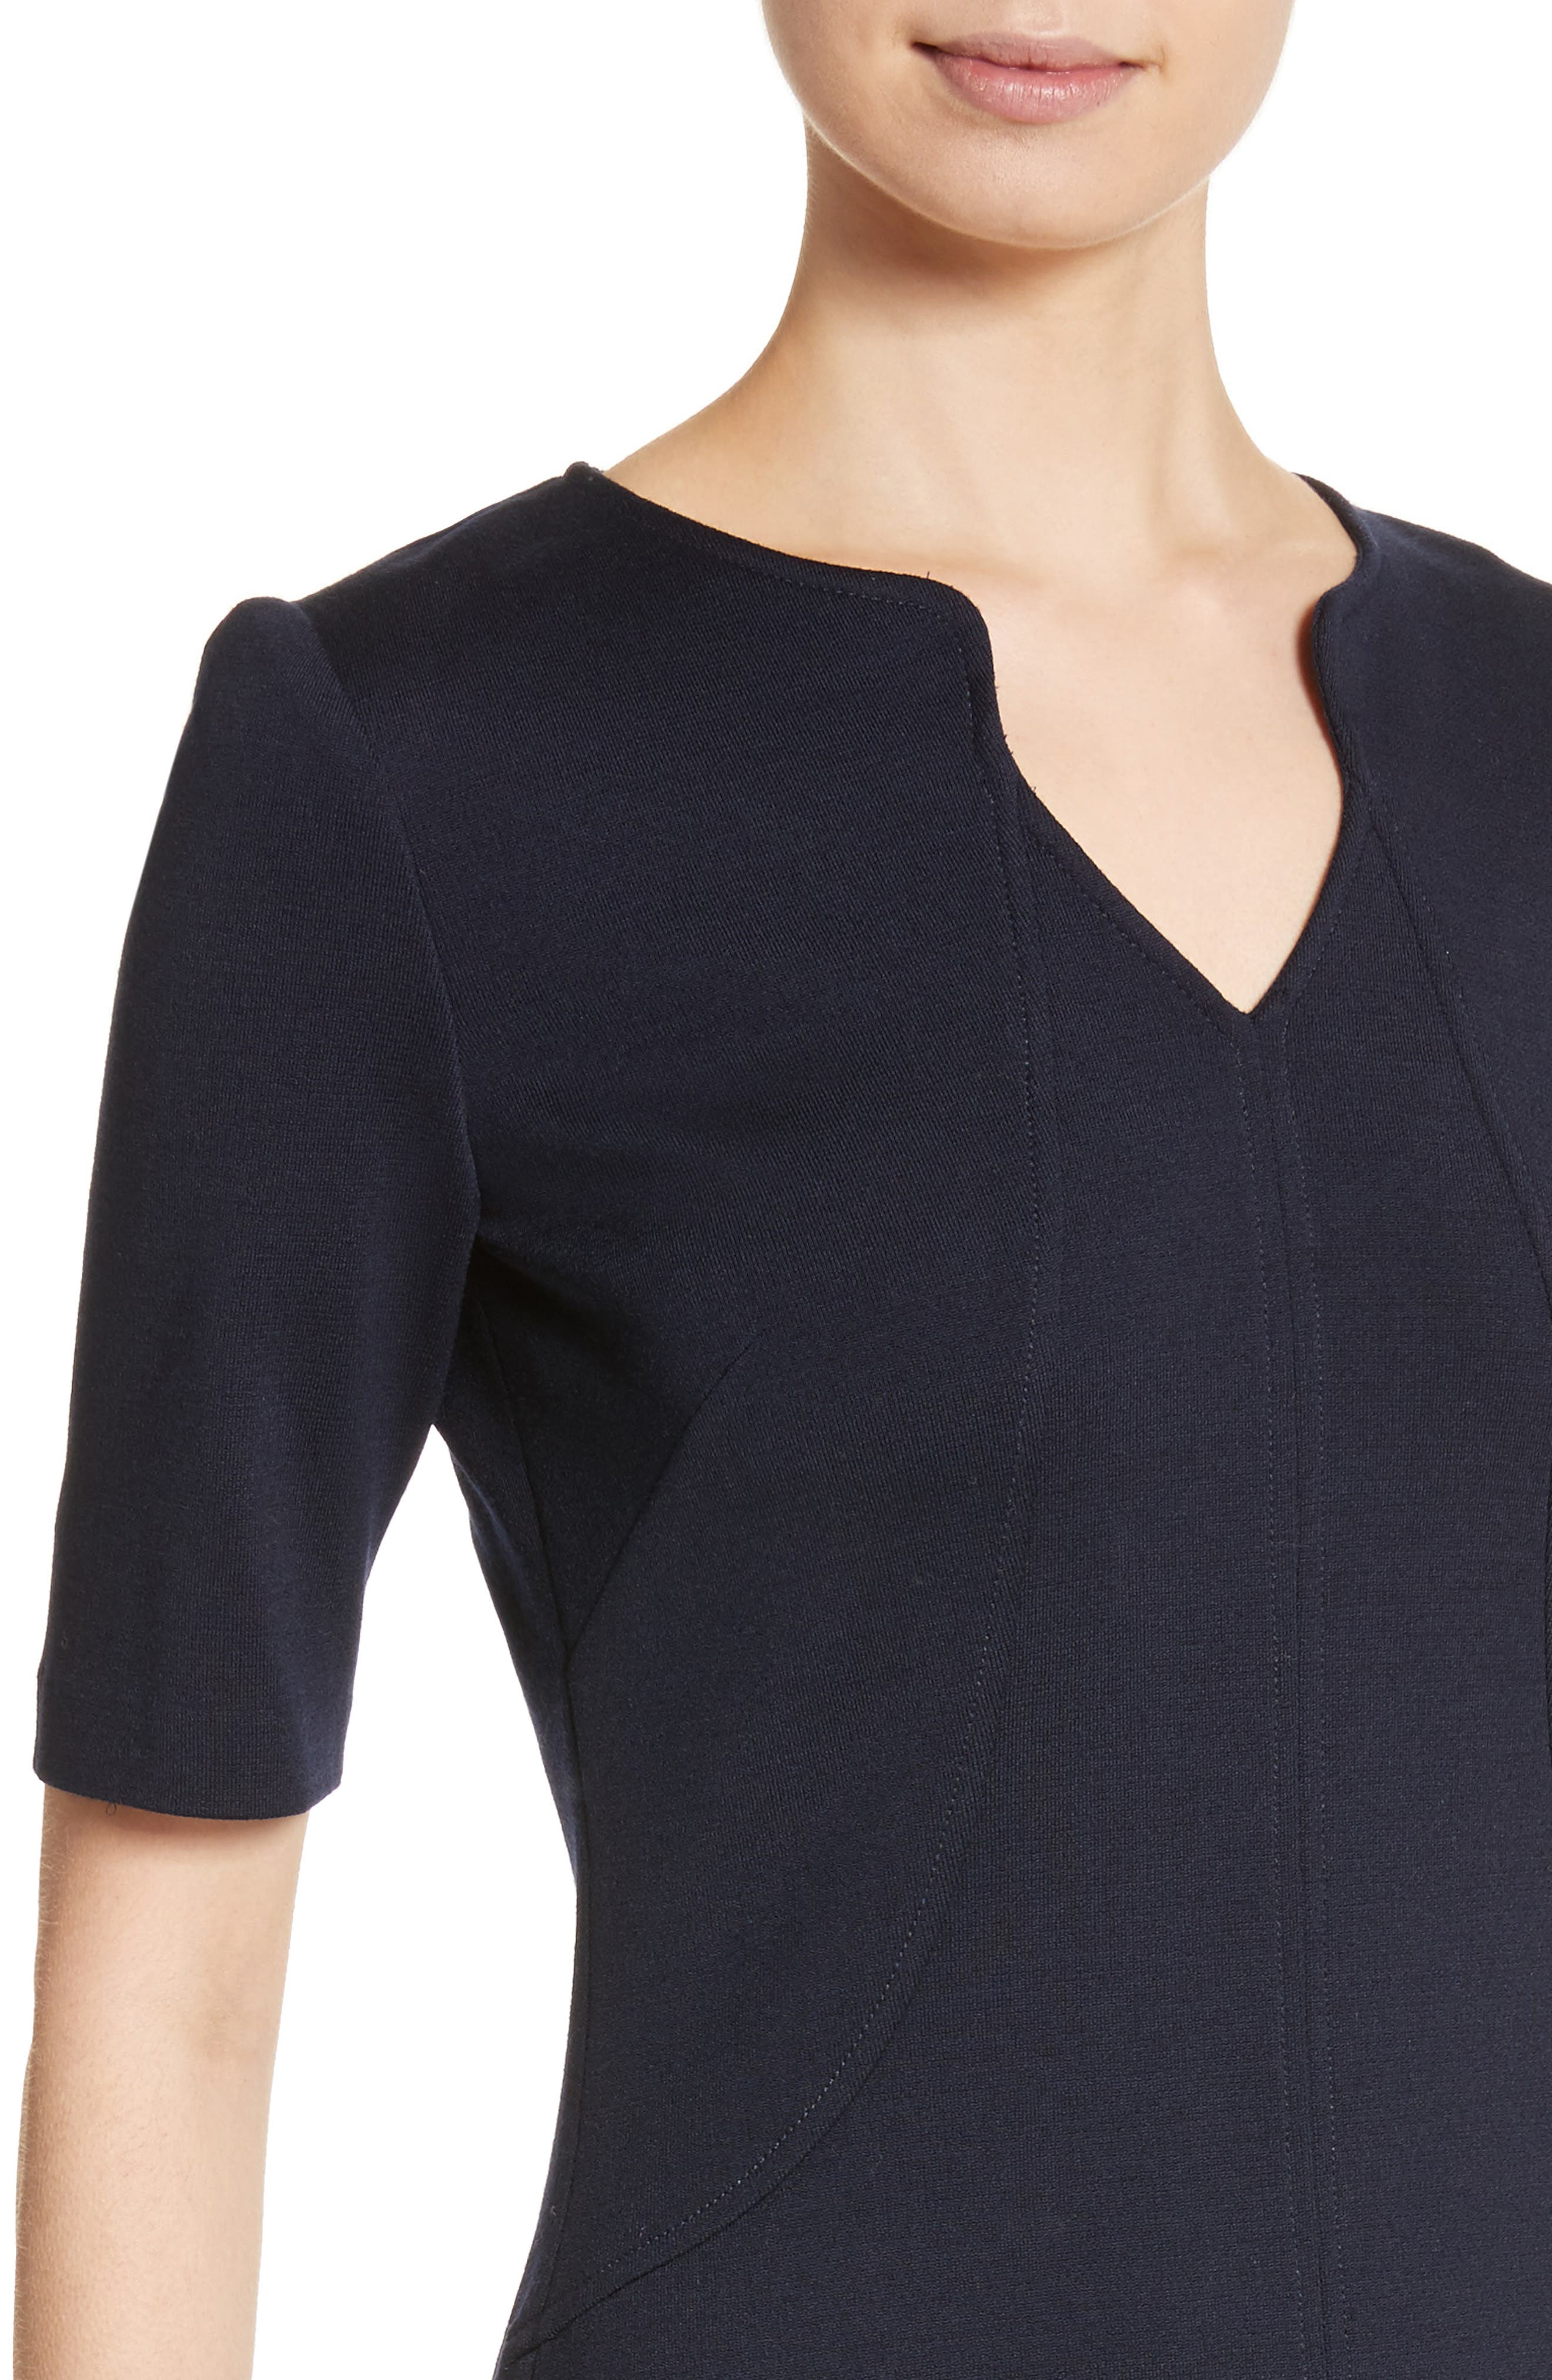 Milano Knit A-Line Dress,                             Alternate thumbnail 4, color,                             Navy